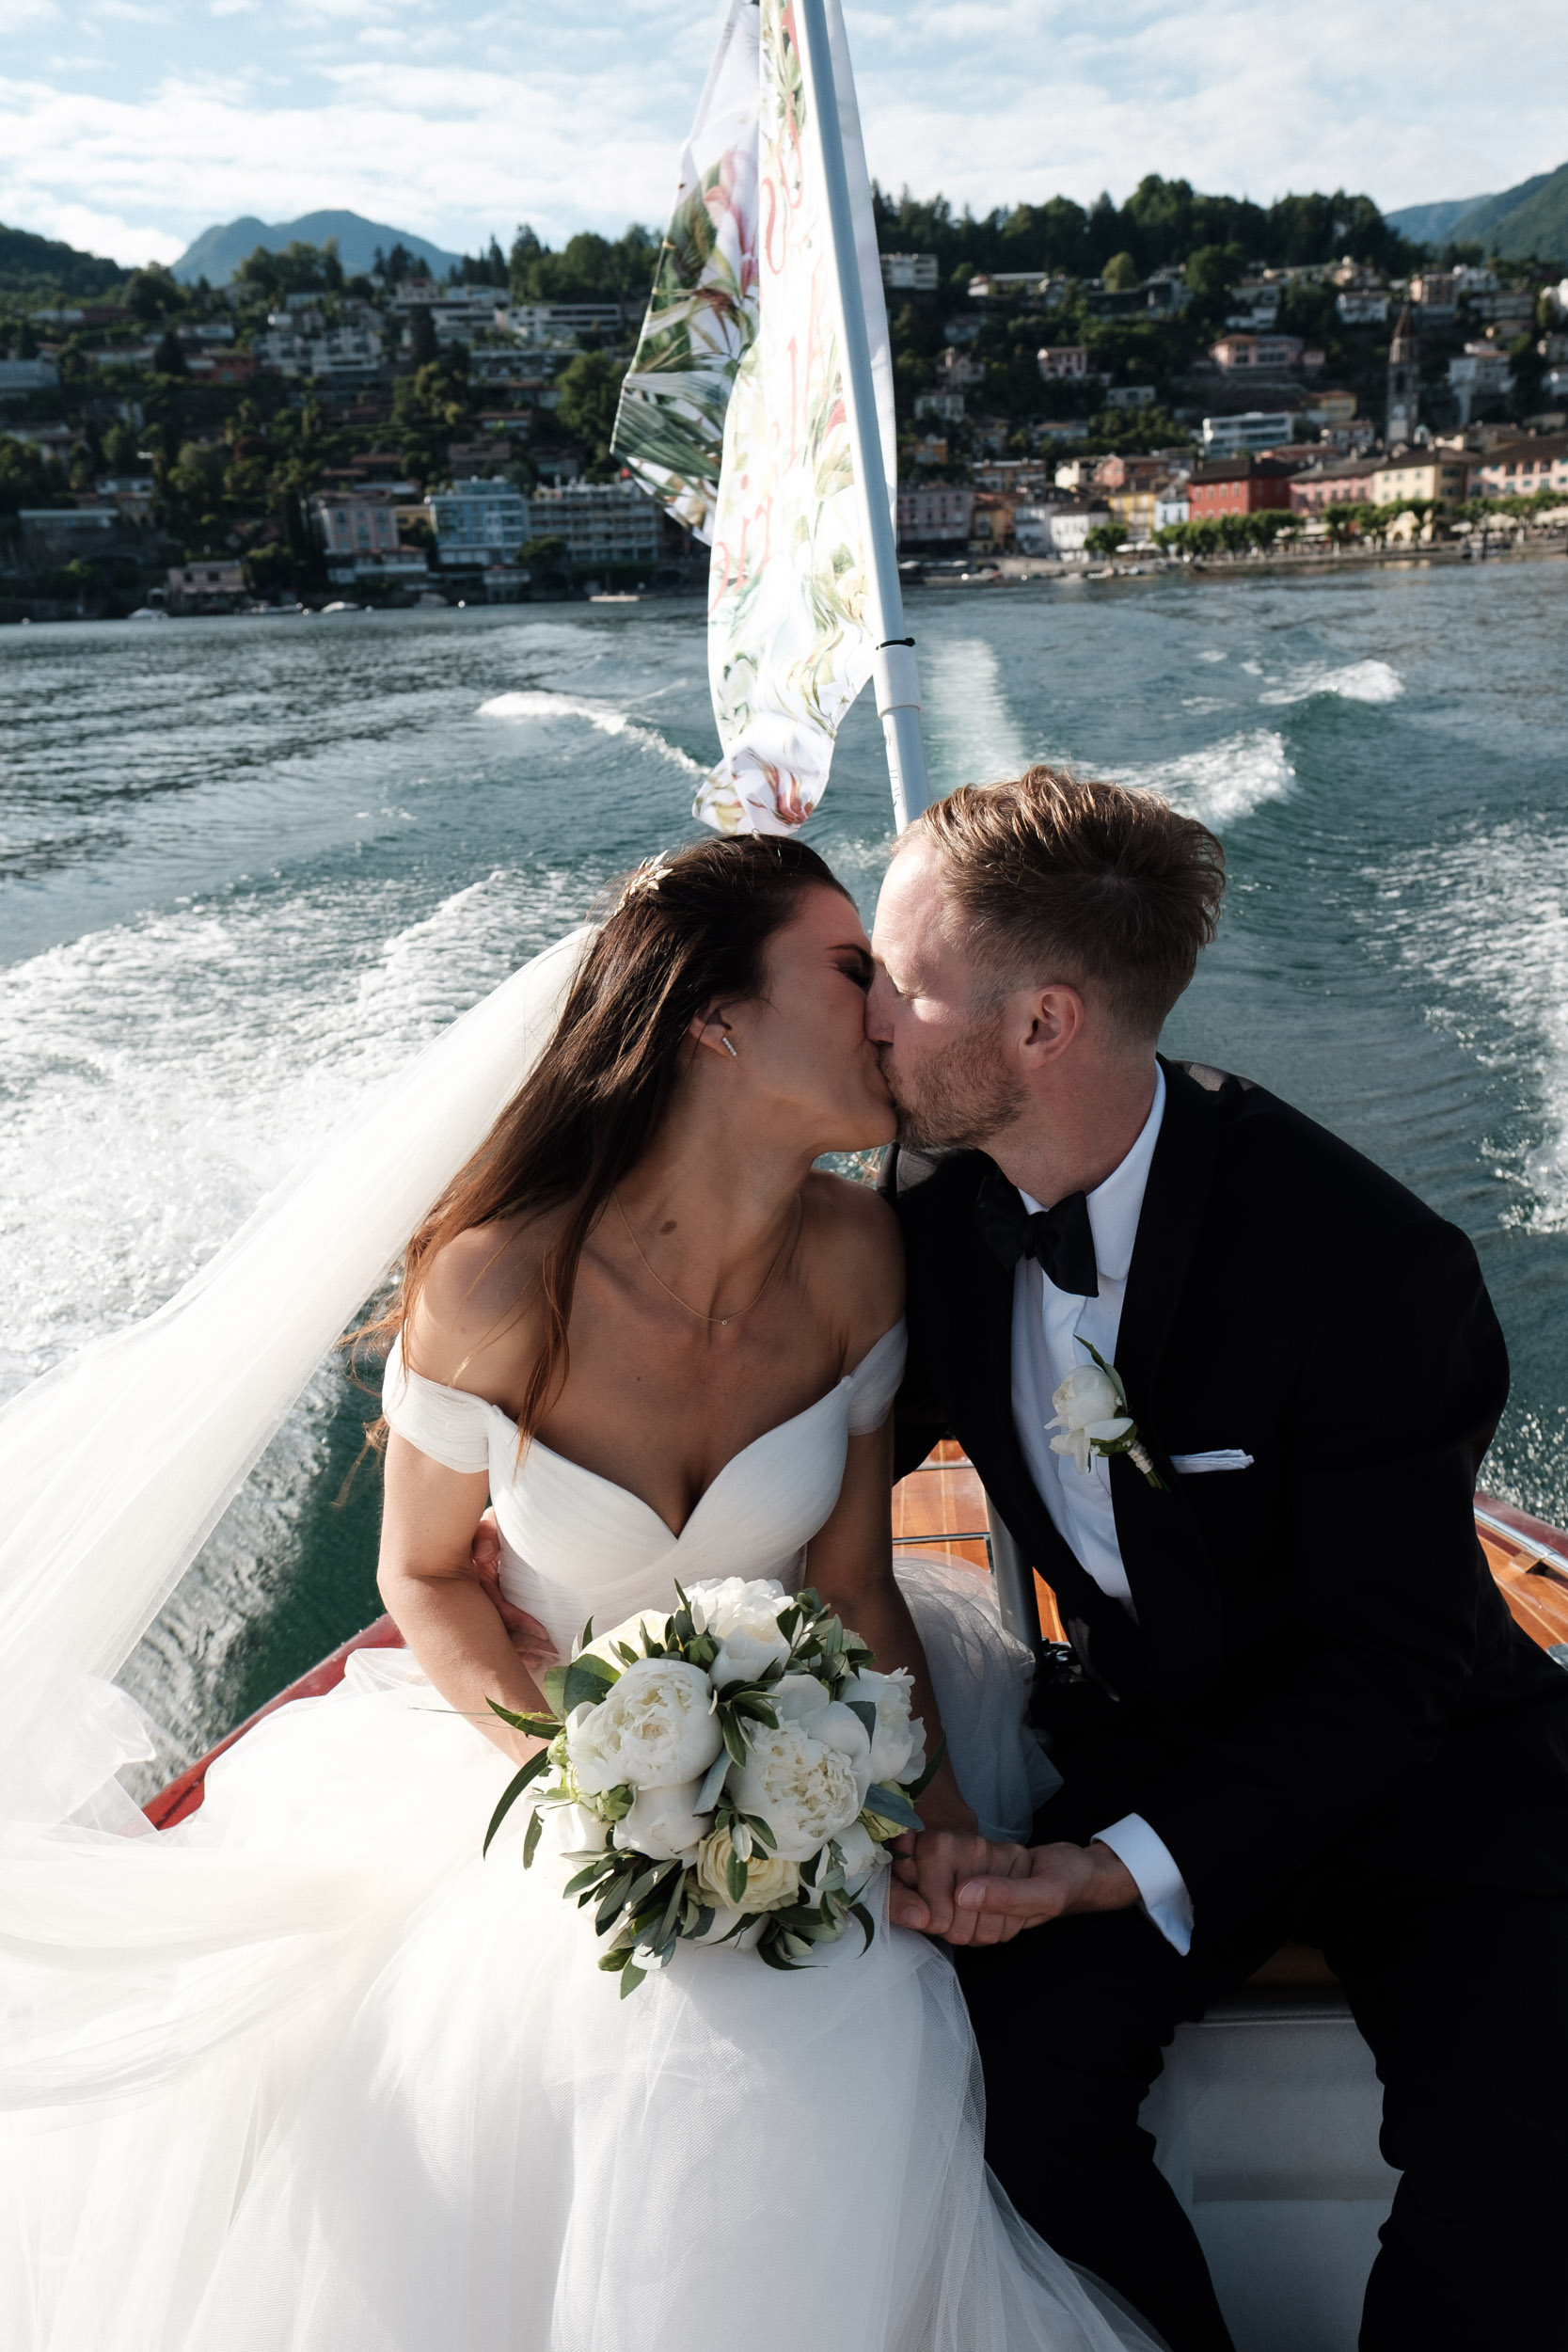 olivia-andreas-wedding-switzerland-437.jpg